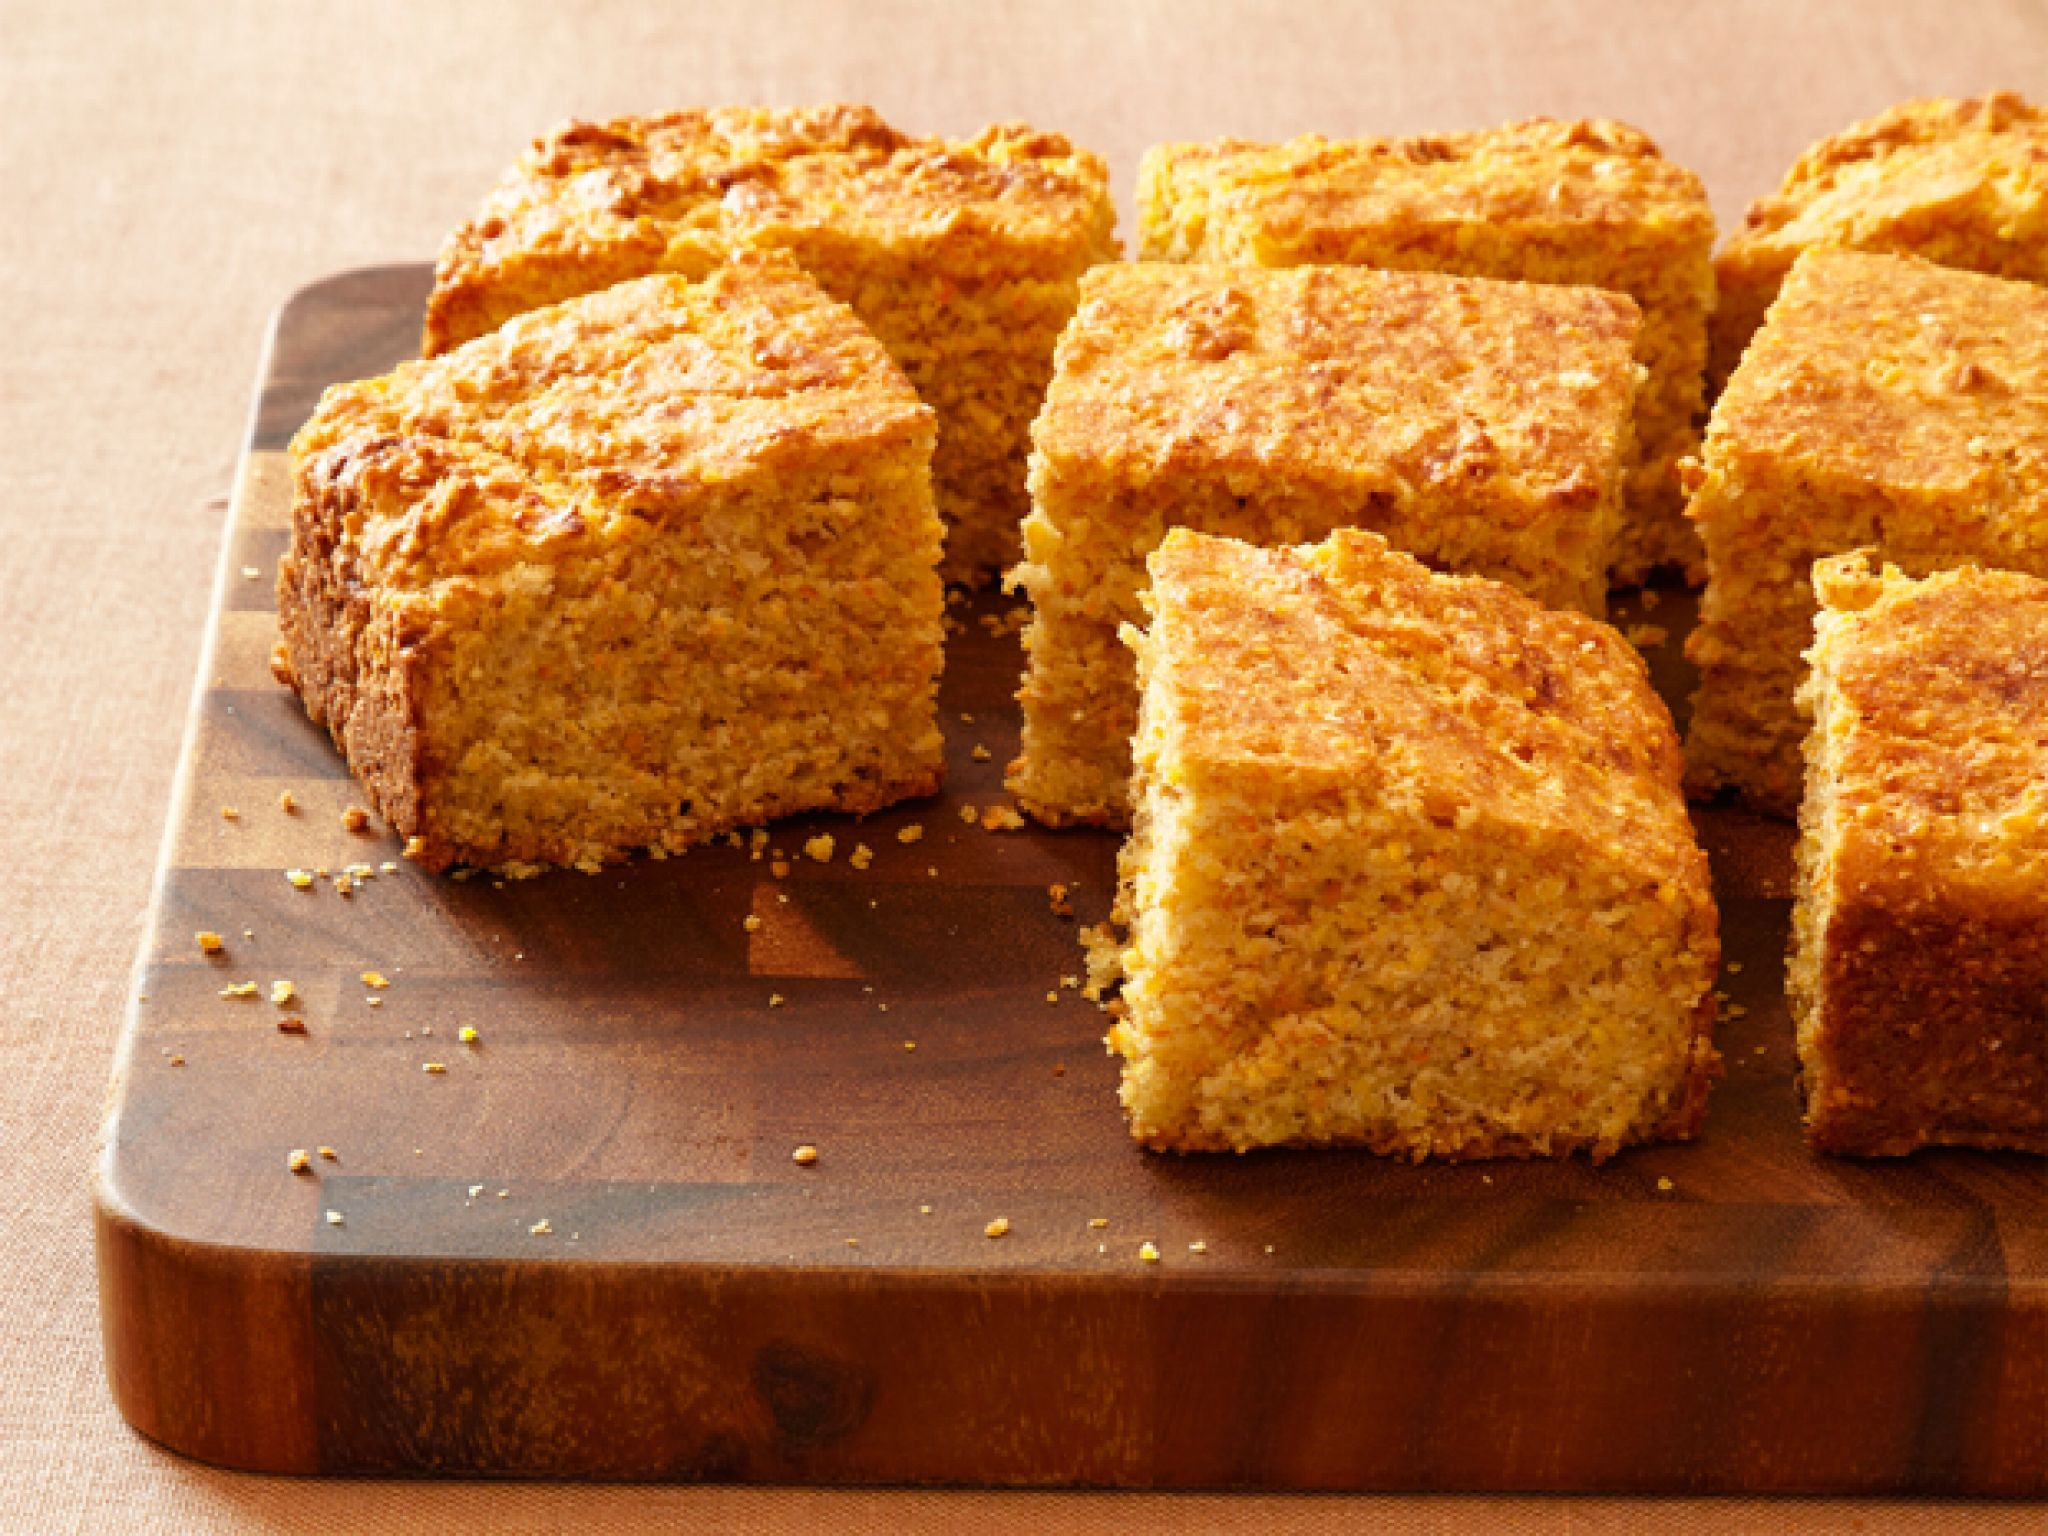 Southern Cornbread Recipe Corn Bread Recipe Food Network Recipes Vegetarian Thanksgiving Recipes